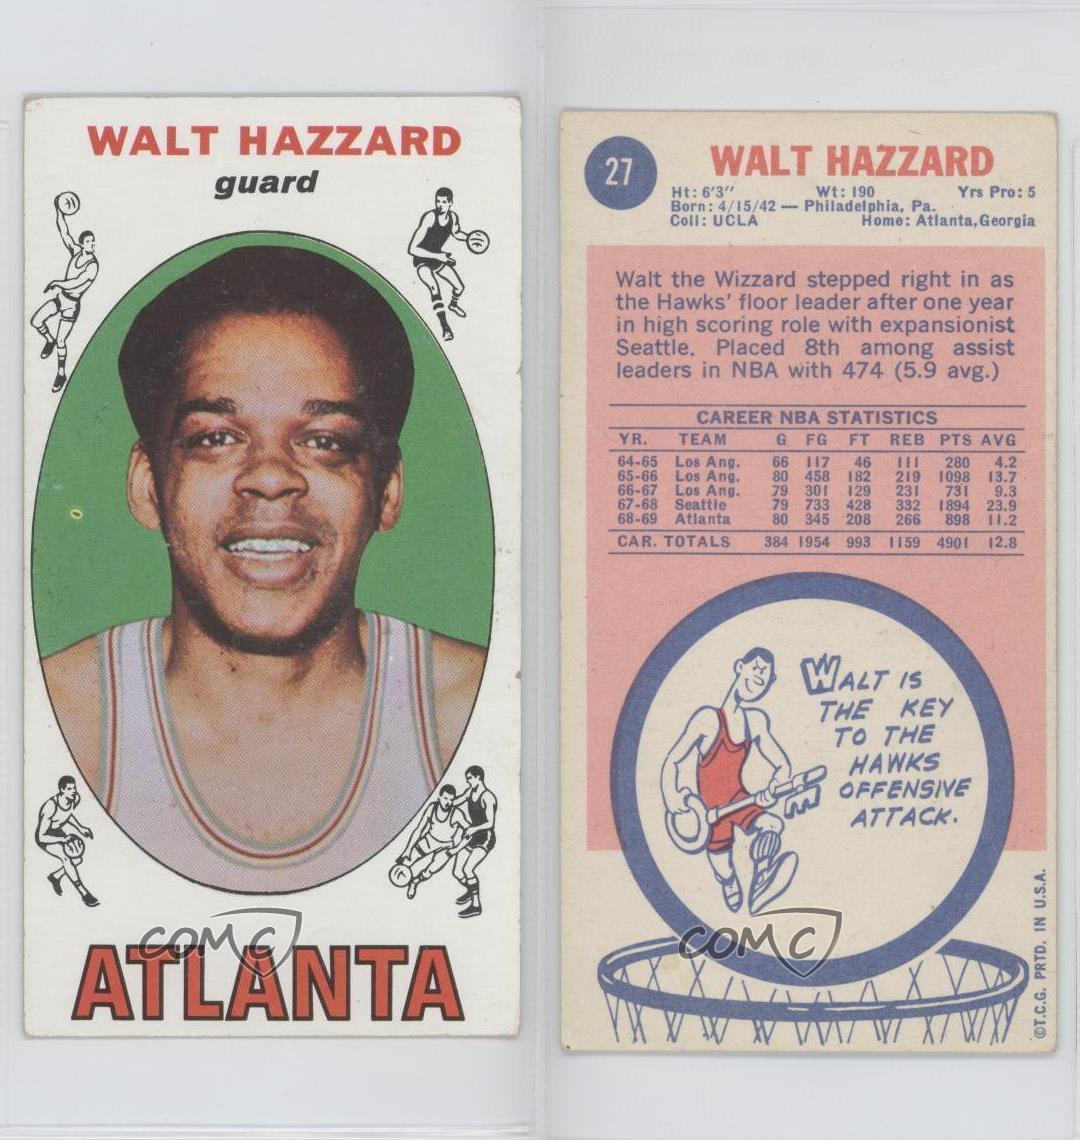 1969-70 Topps #27 Walt Hazzard Atlanta Hawks RC Rookie